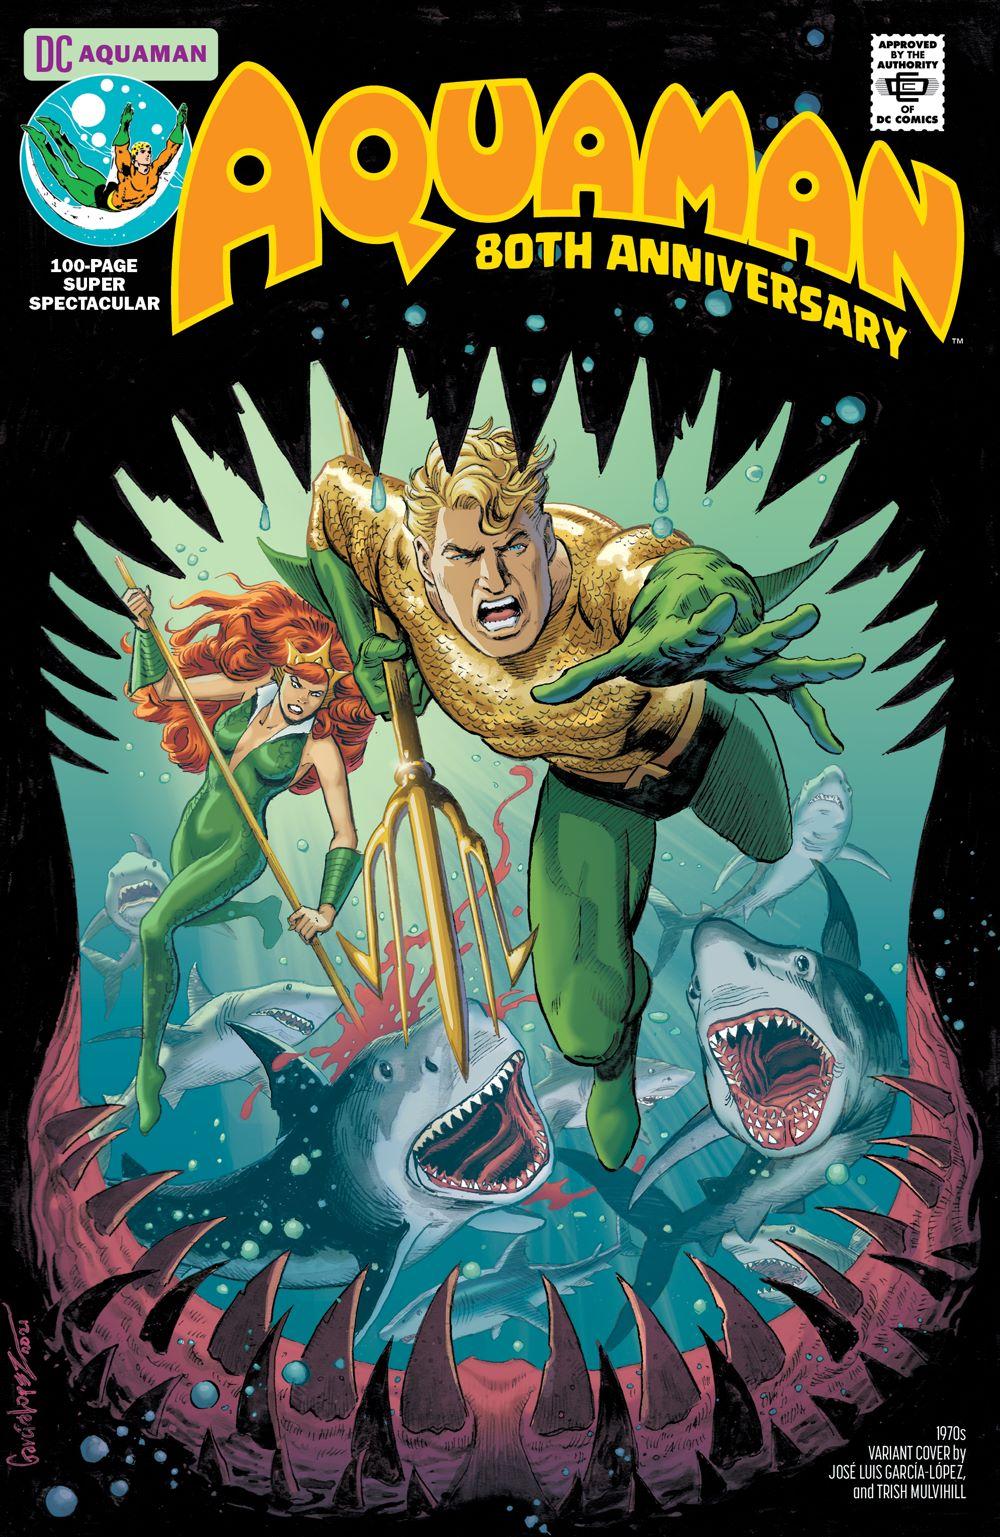 AQM_80THANN_Cv1_1970s_var DC Comics August 2021 Solicitations